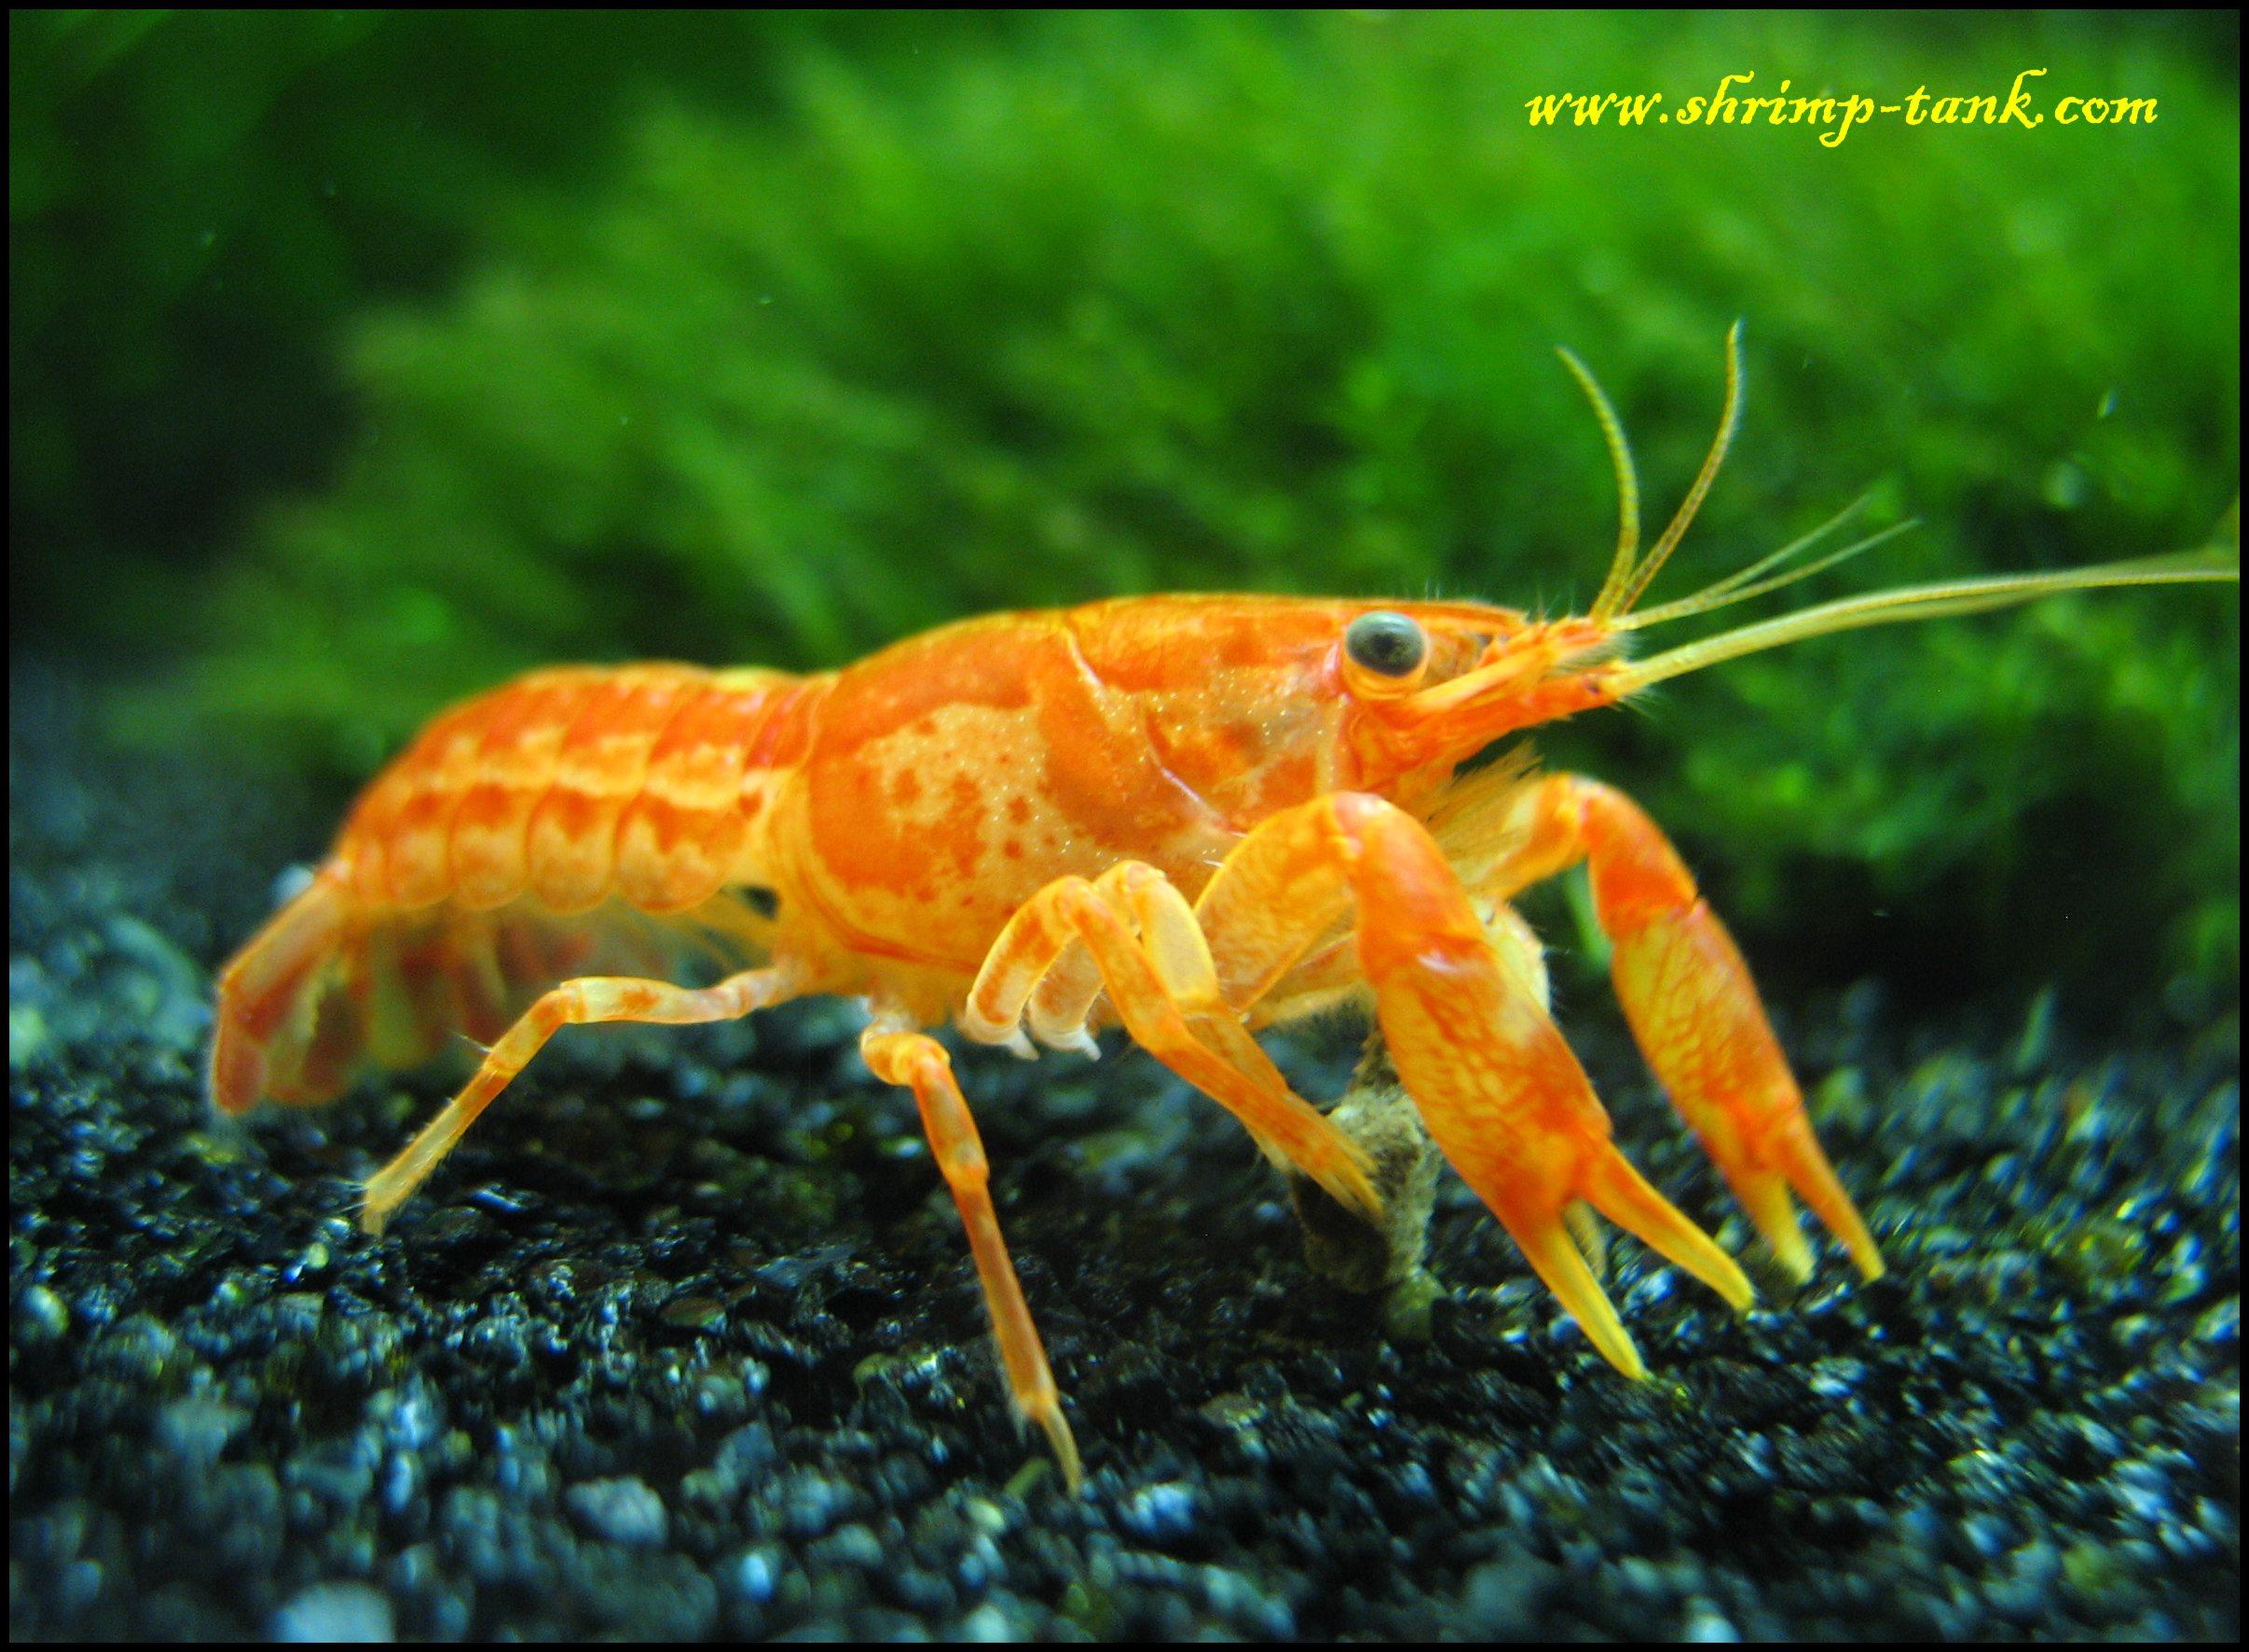 Green babaulti shrimps are eating a fancy shrimp food